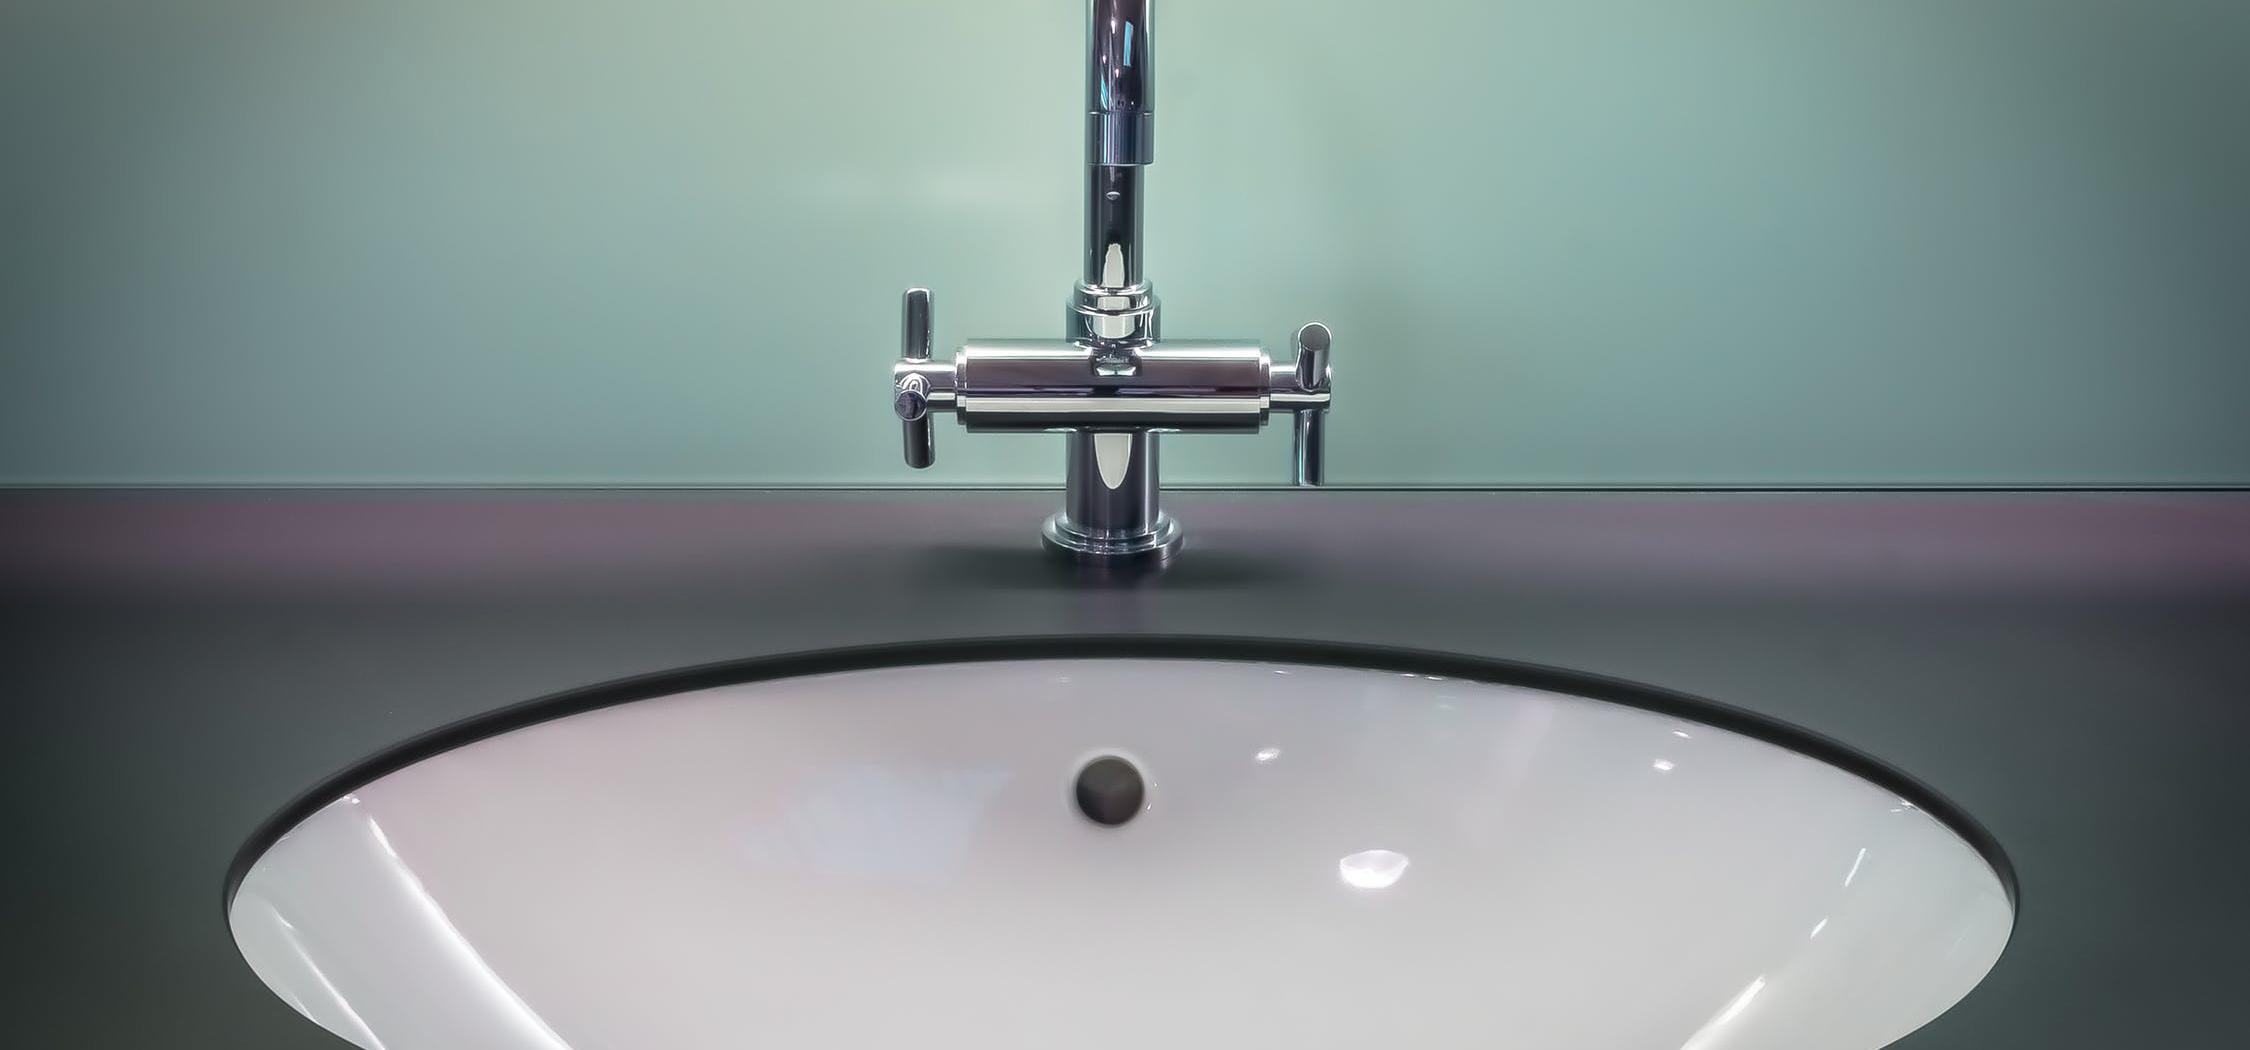 7-tips-for-renovating-your-bathroom-7.jpeg